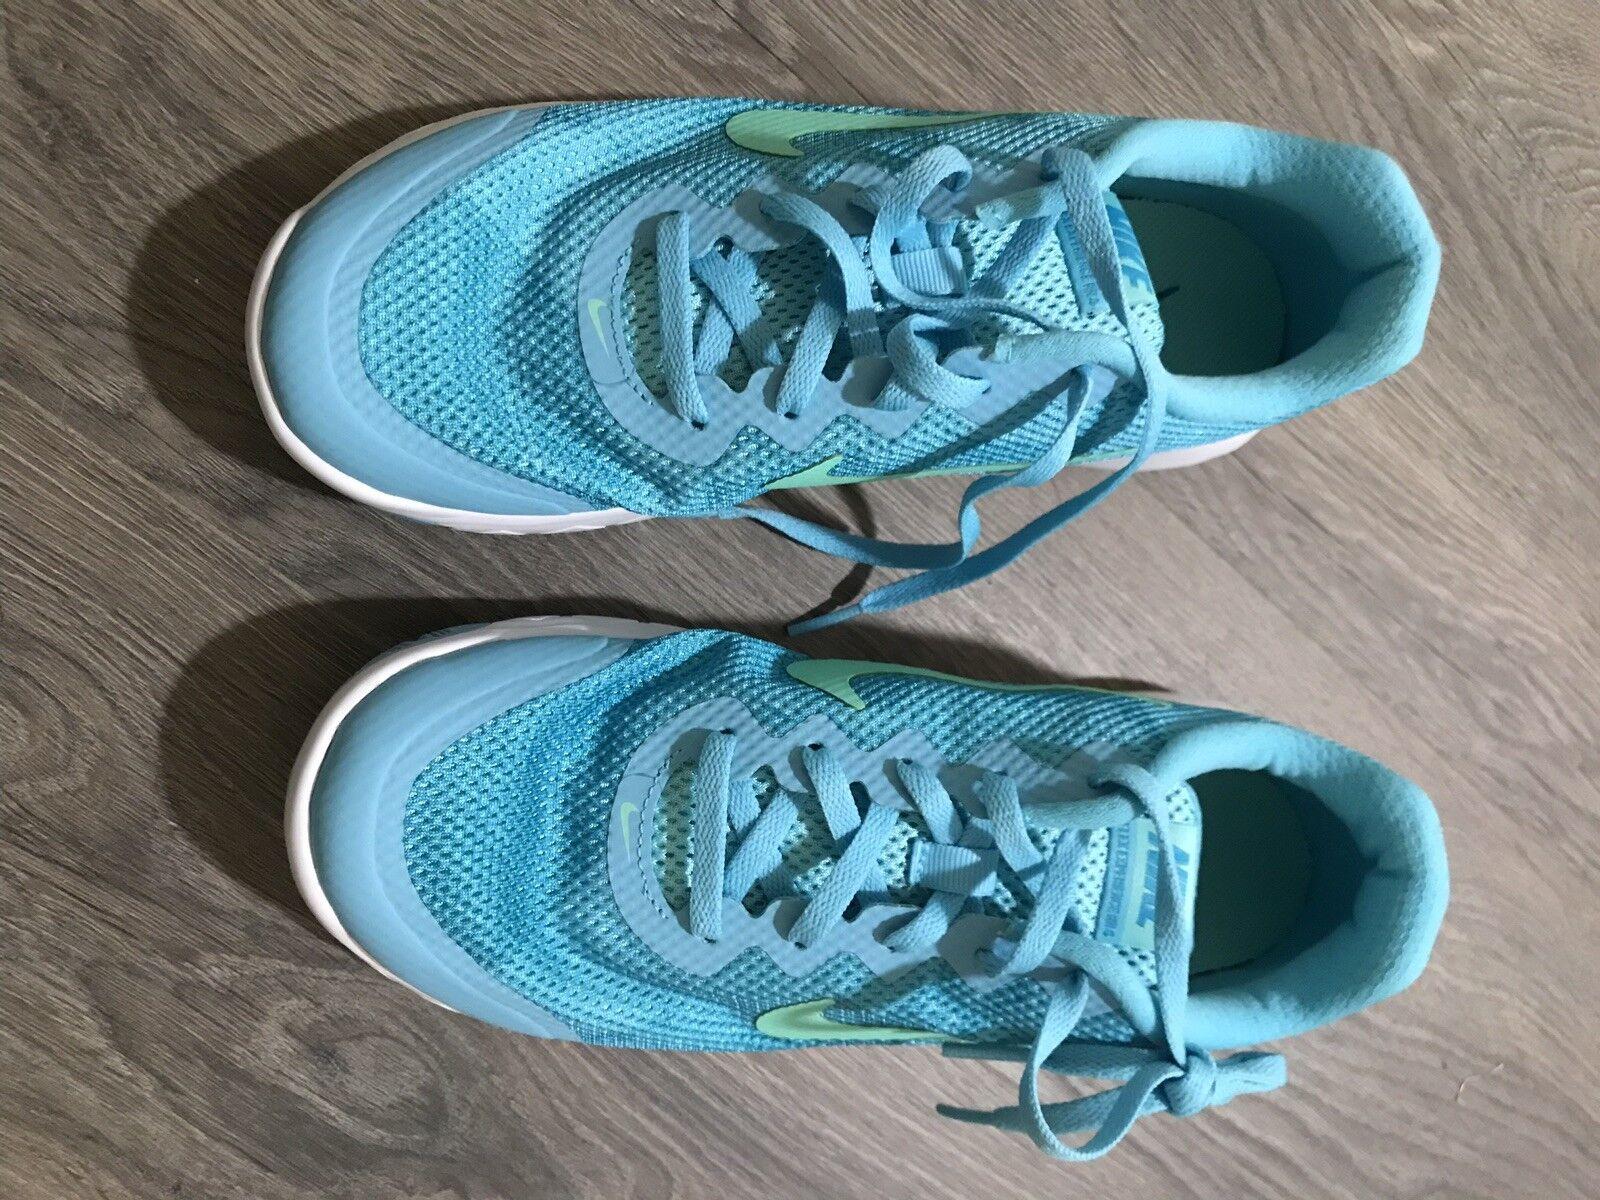 Nike Wonens shoes shoes shoes Size 8 bluee 787445